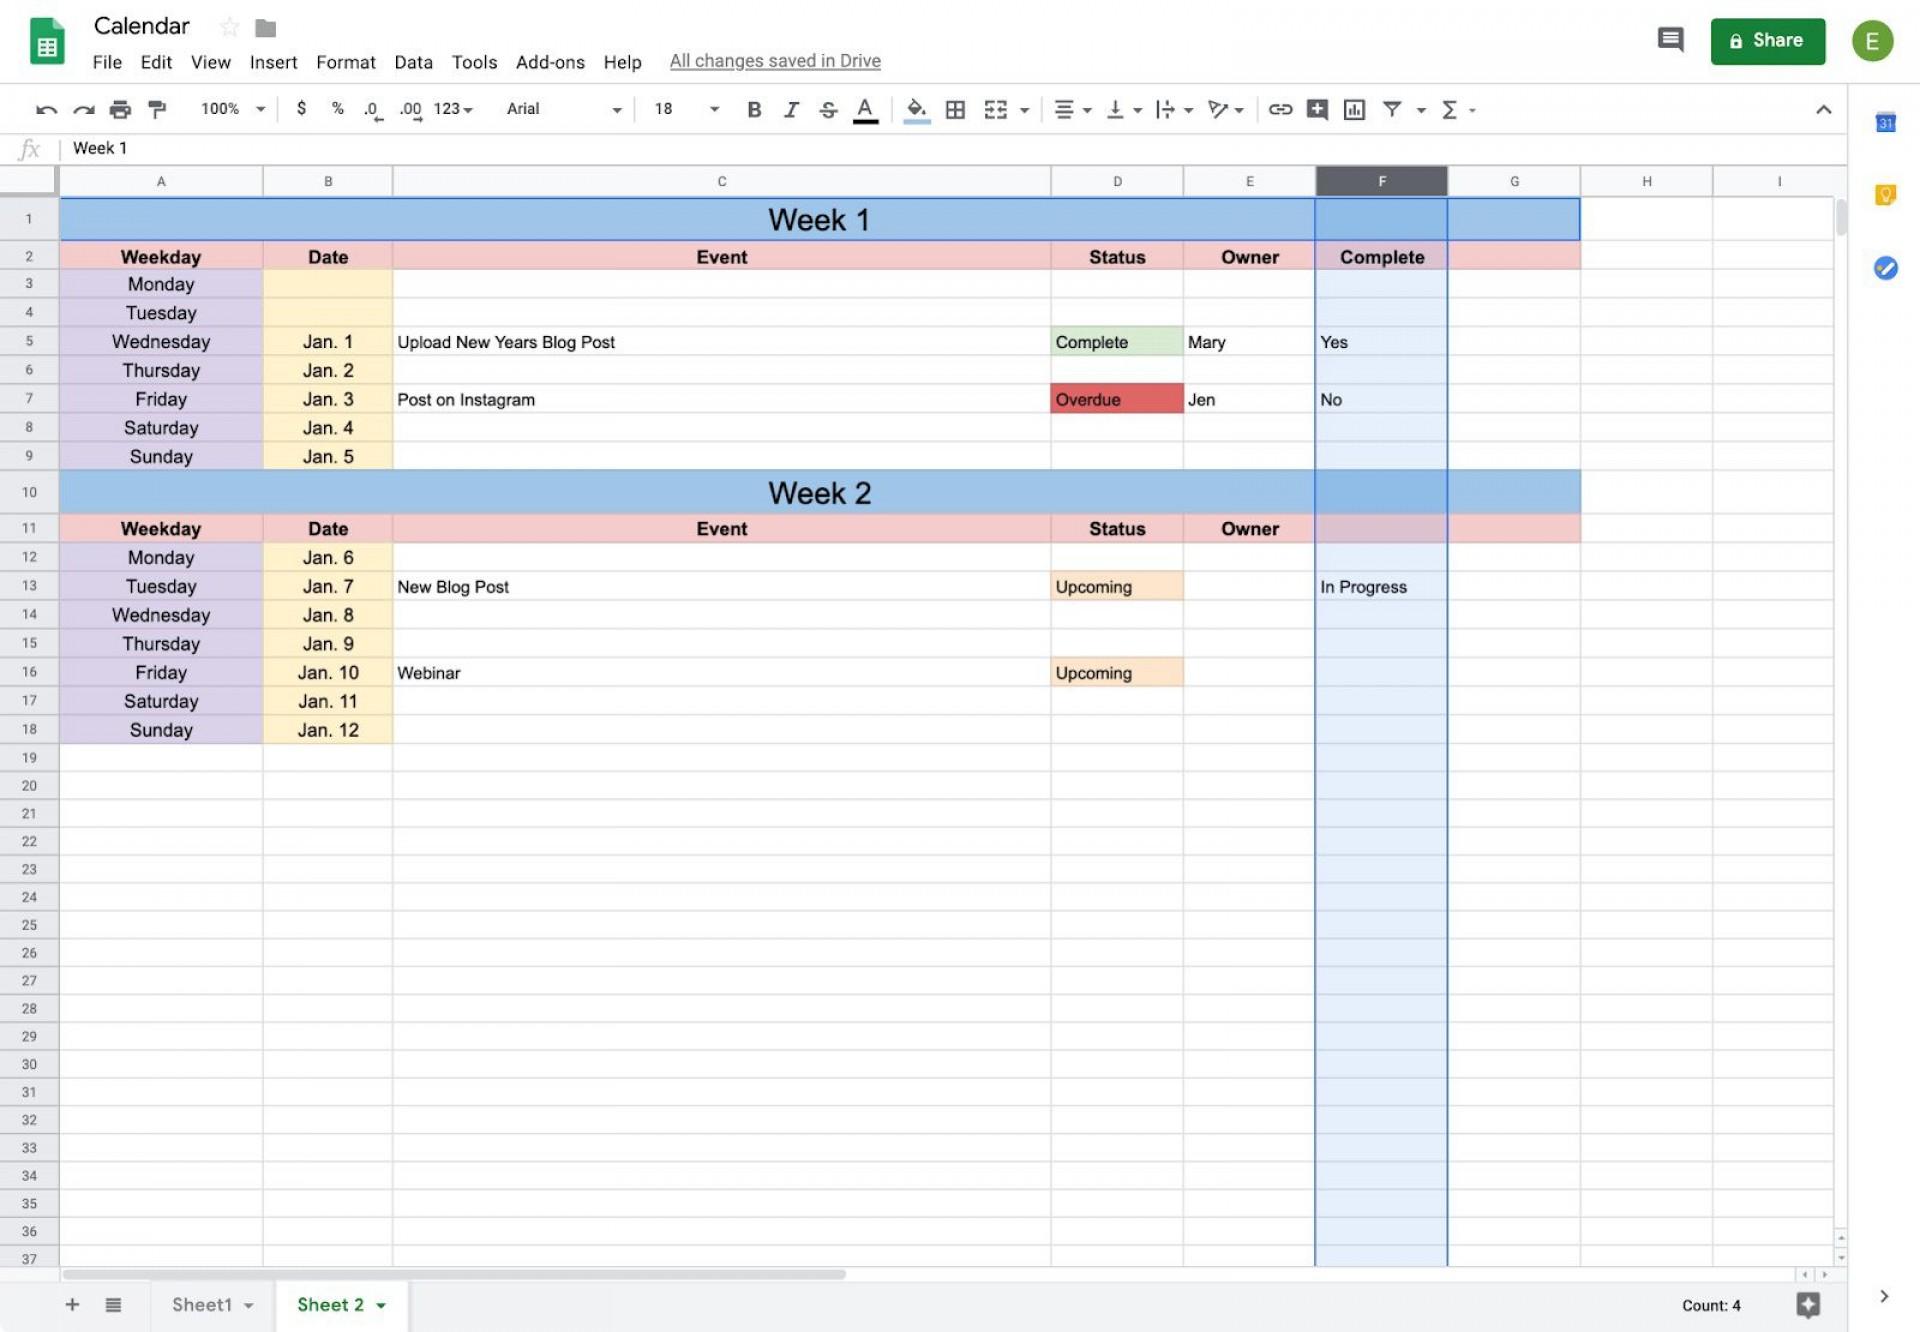 002 Amazing Calendar Template Google Doc Example  Docs Editable Two Week 2019-201920